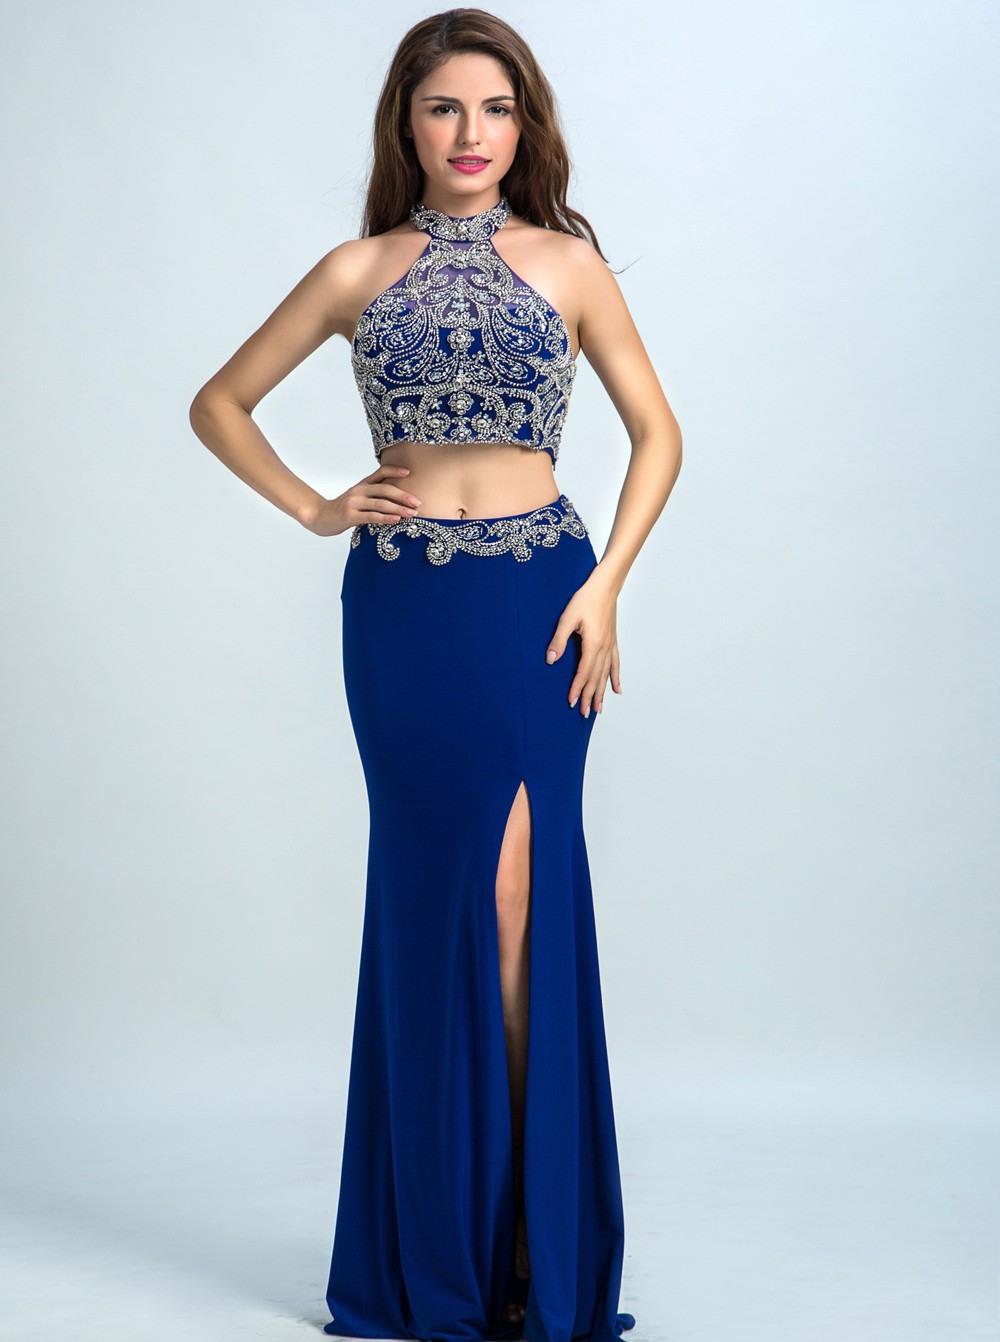 13 Cool Abend Dress Online Spezialgebiet17 Genial Abend Dress Online Bester Preis